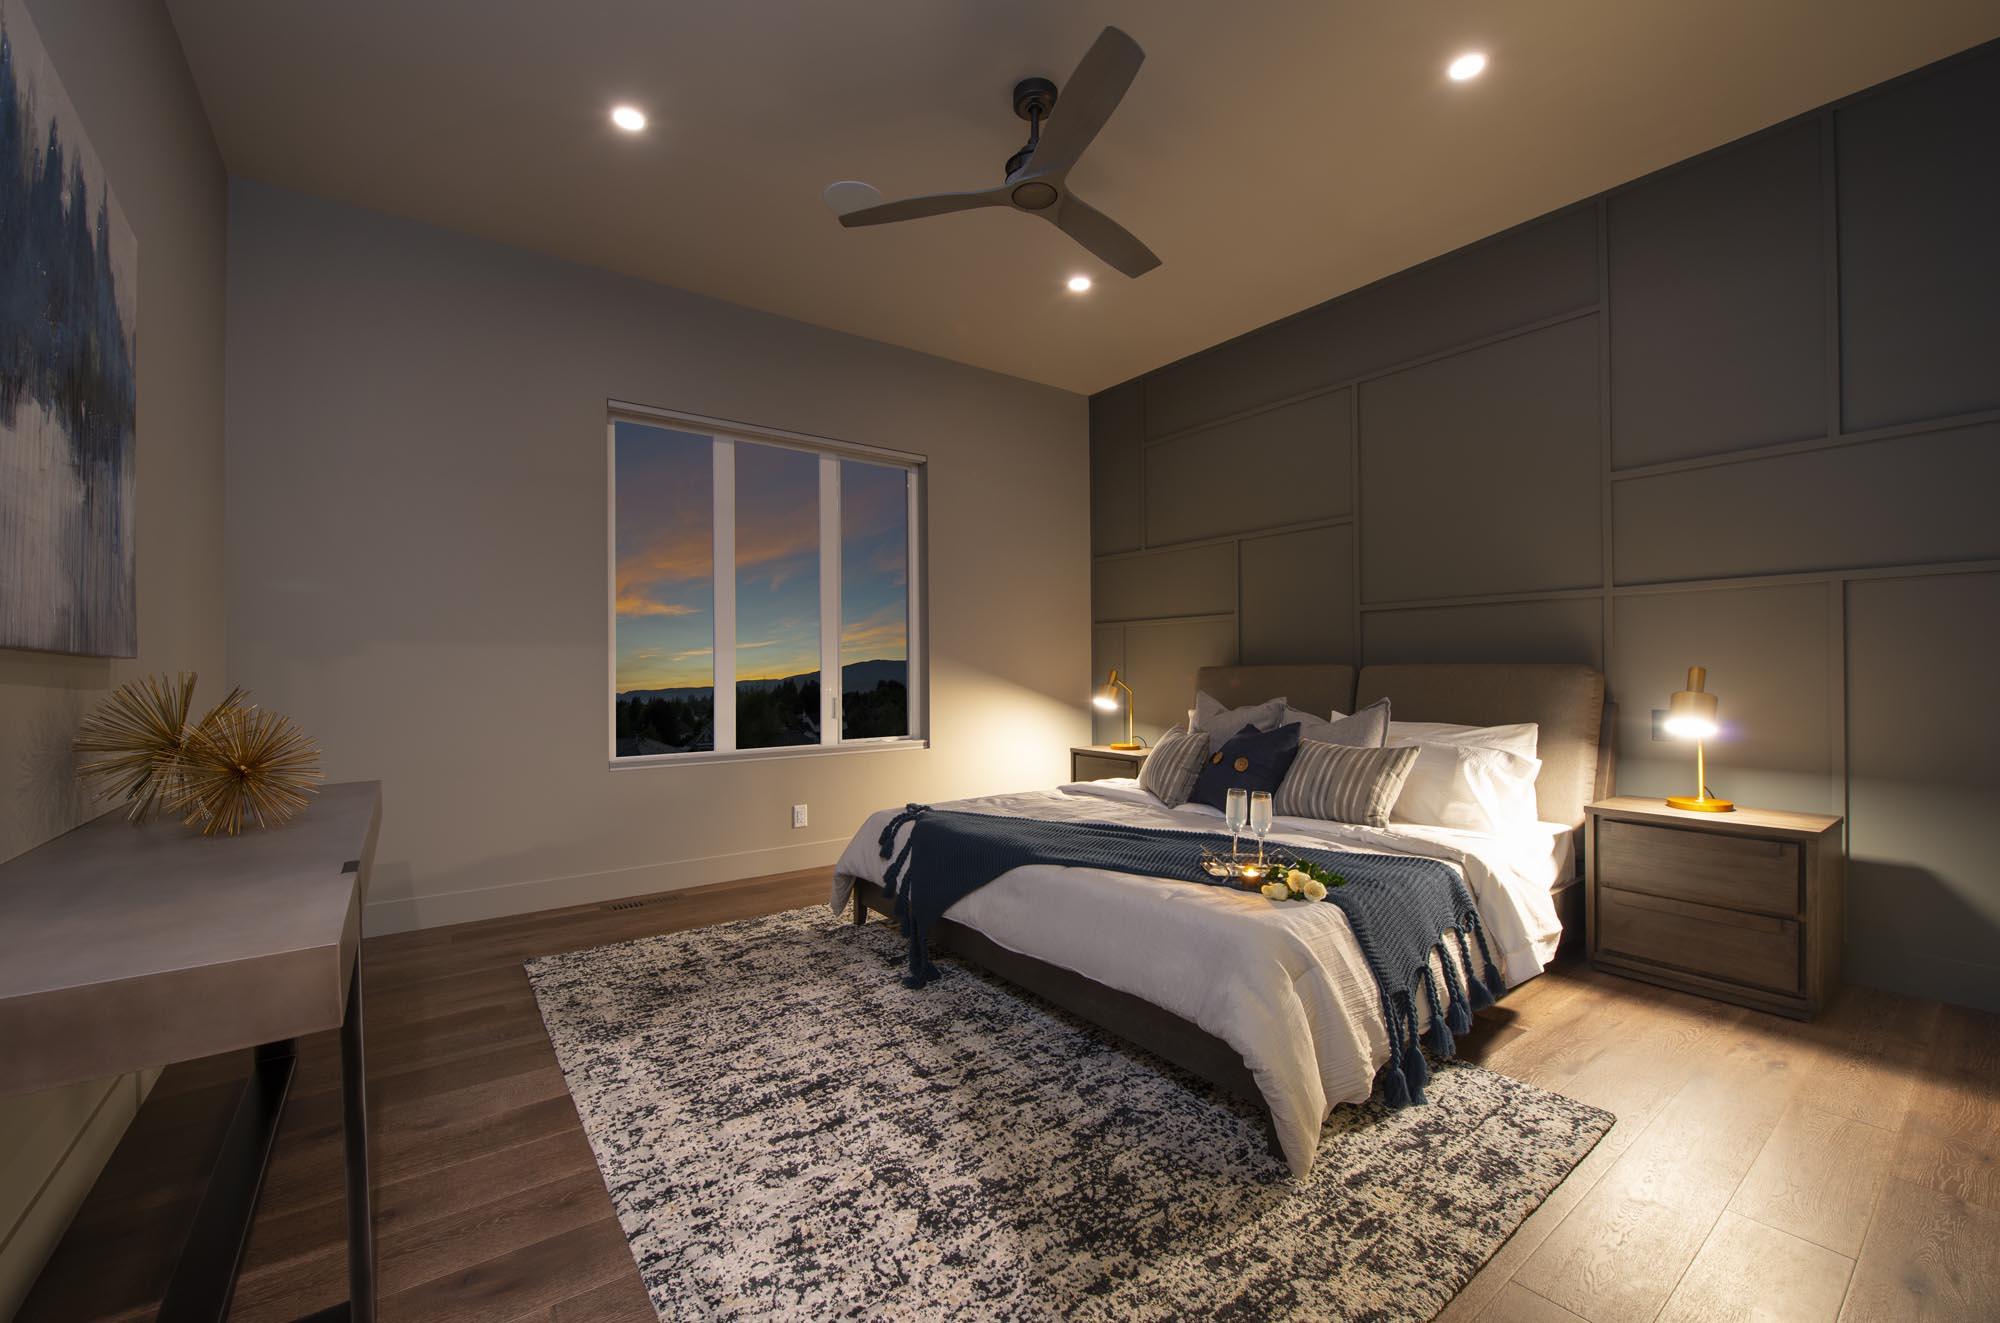 09-Master Bedroom